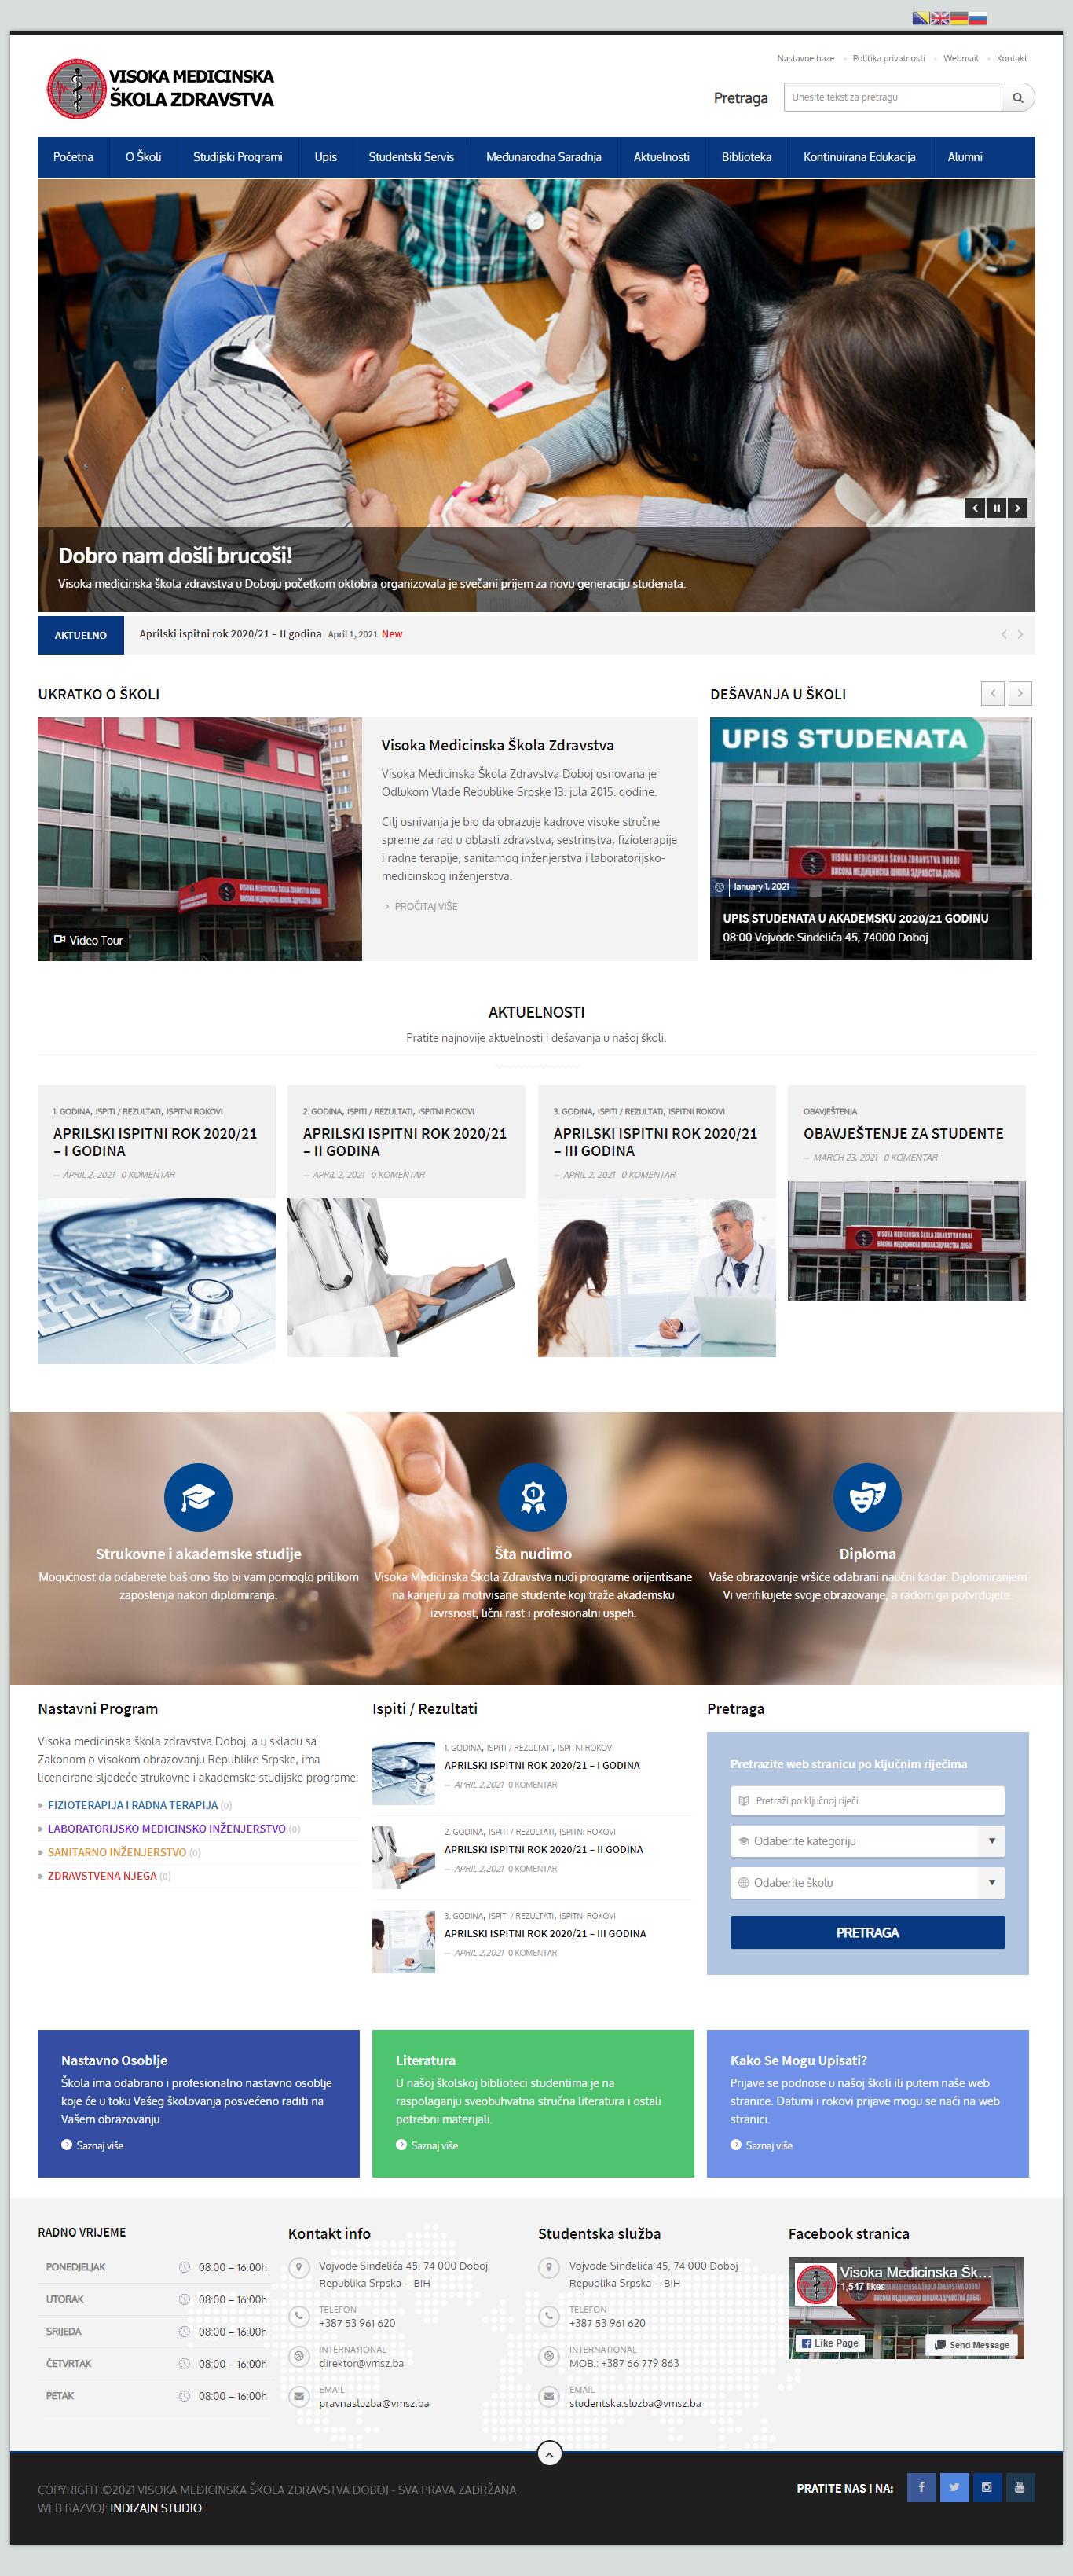 screencapture-vmsz-INdizajn-Studio-izrada-web-stranica-i-graficki-dizajn-FULL-SITE